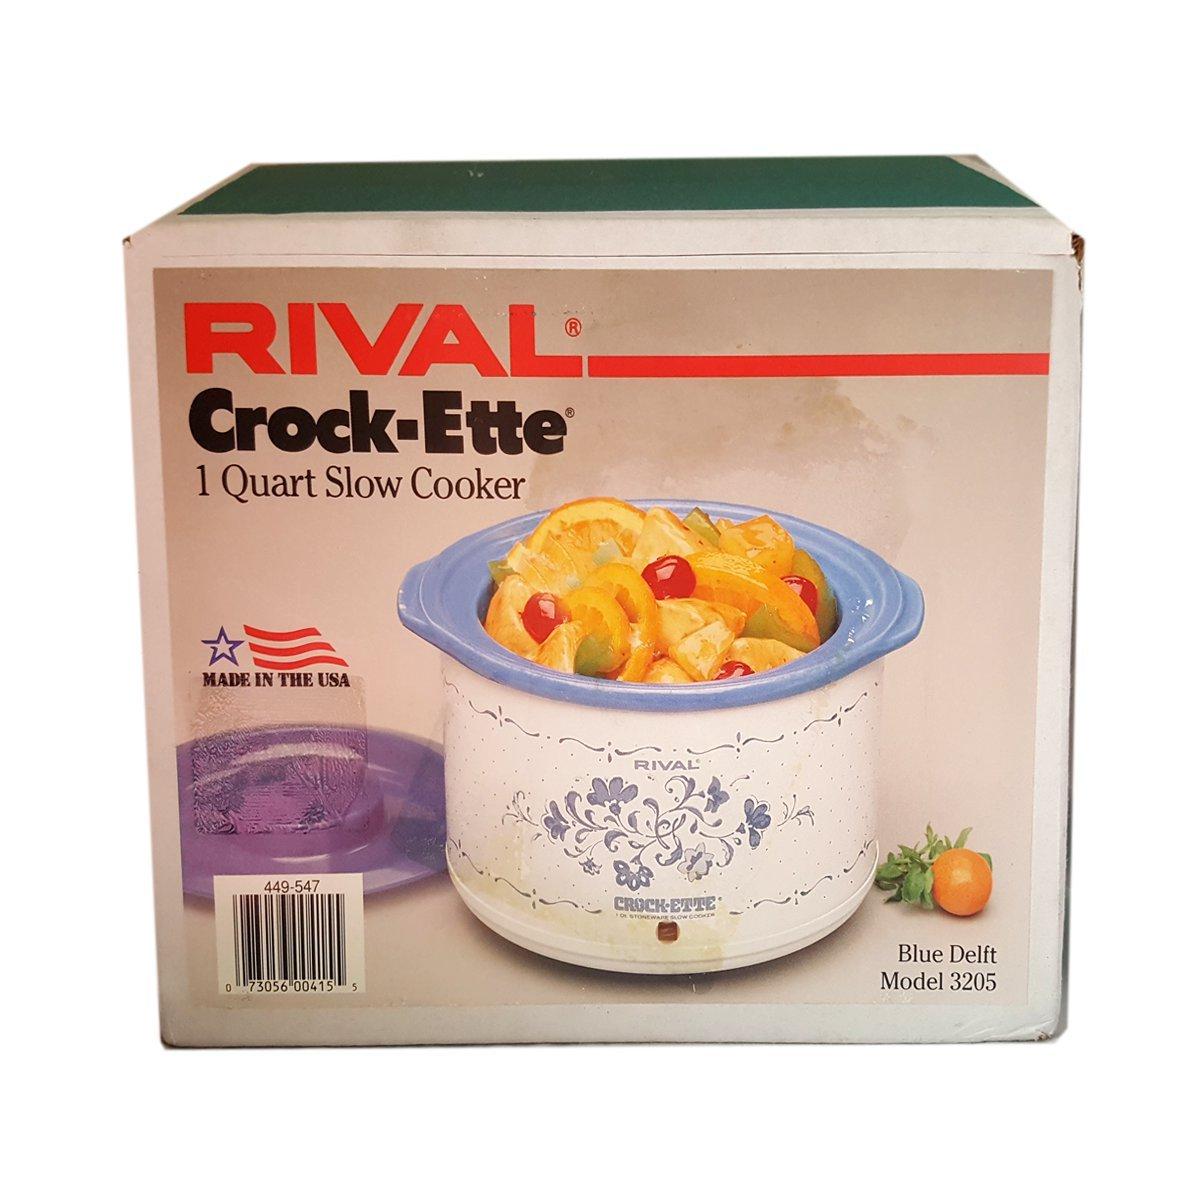 Rival Vintage 1986 Crock Pot Model 3205 Blue Delft 1 Quart Slow Cooker